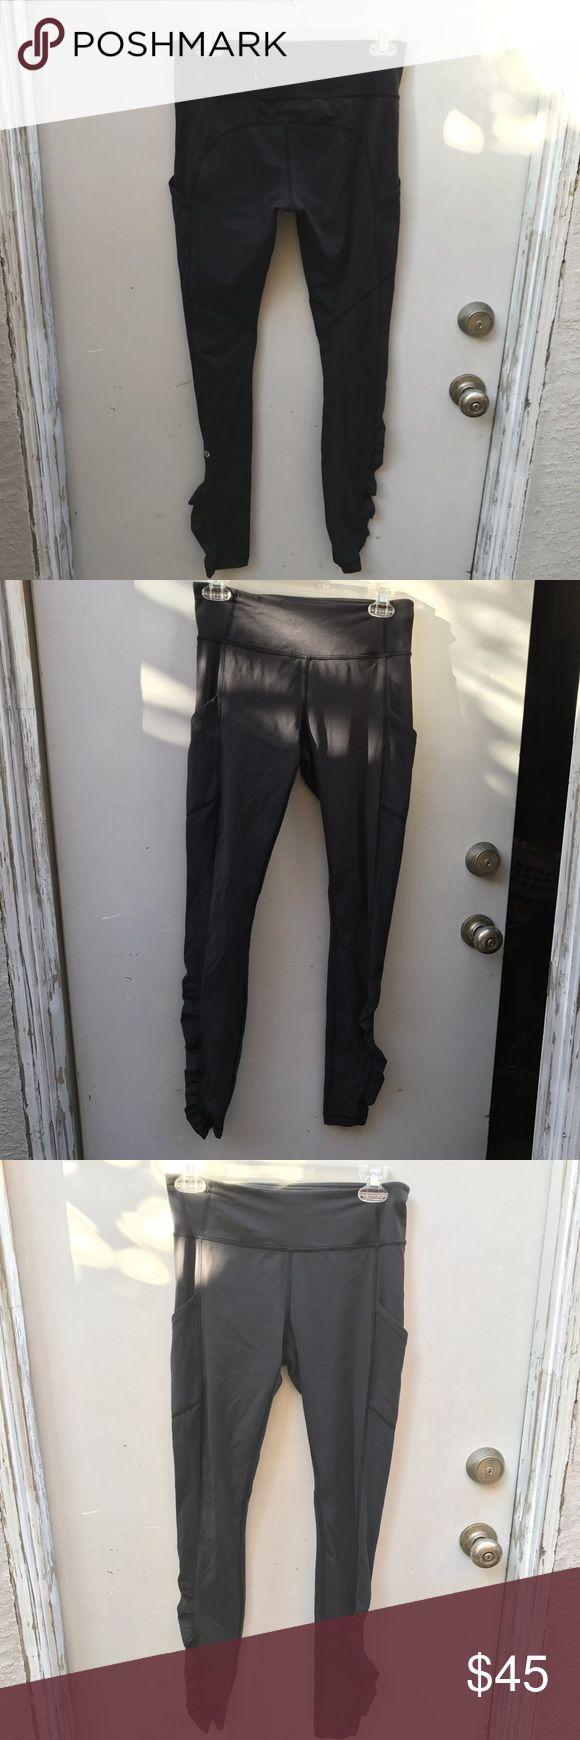 Lululemon black scrunched leggings Size 6 // color black / scrunchy heel // side pockets / zipper / no fading no rips no stains/ get your workout done /) lululemon athletica Pants Leggings